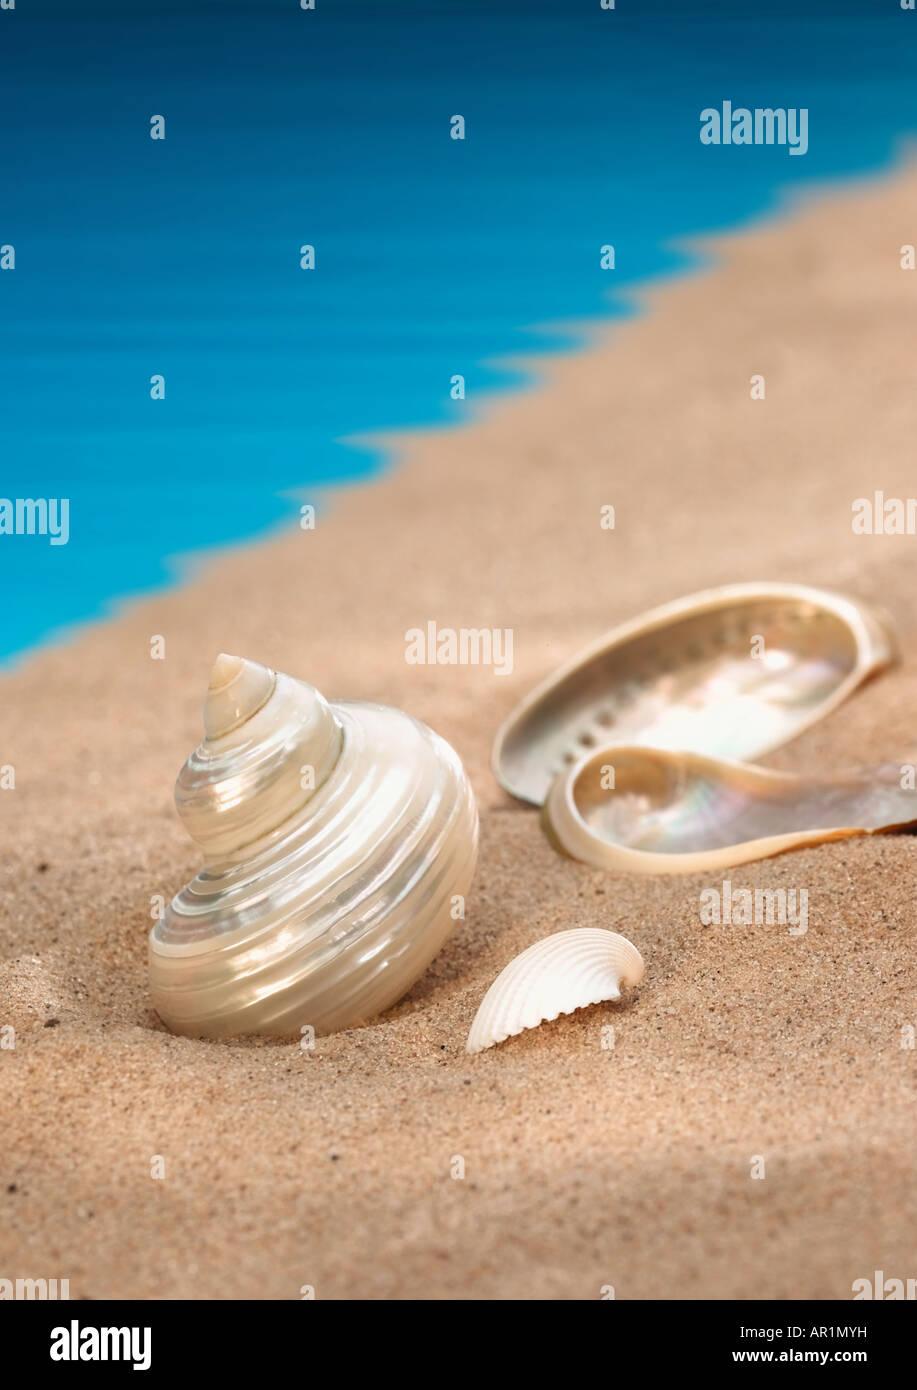 seashore - Stock Image